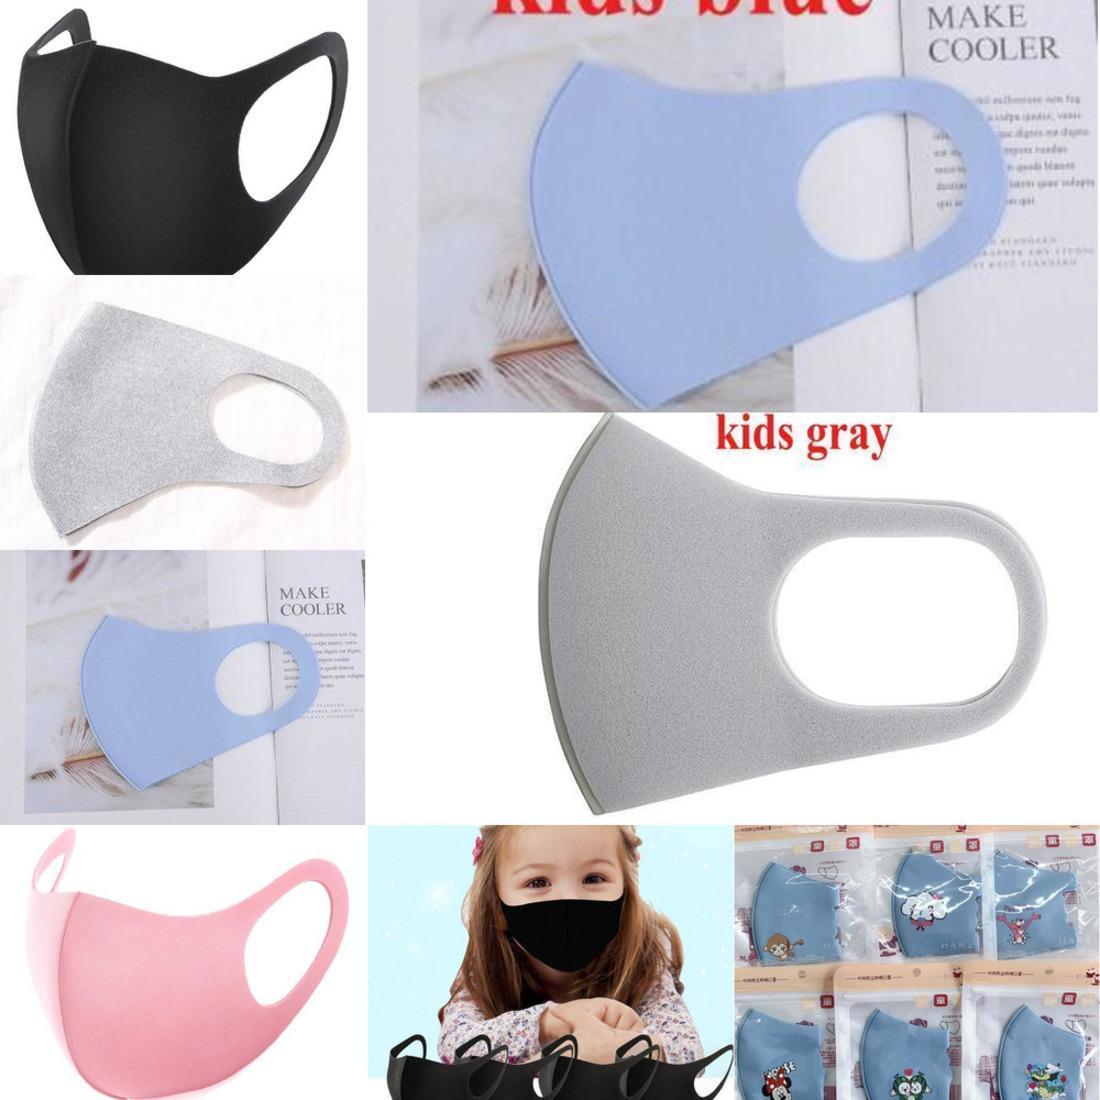 2021100 Rosto Pcs Poeira Anti Mask Adulto Crianças cobrir a boca PM2.5 Dustproof Anti-bacteriana foi 7snr